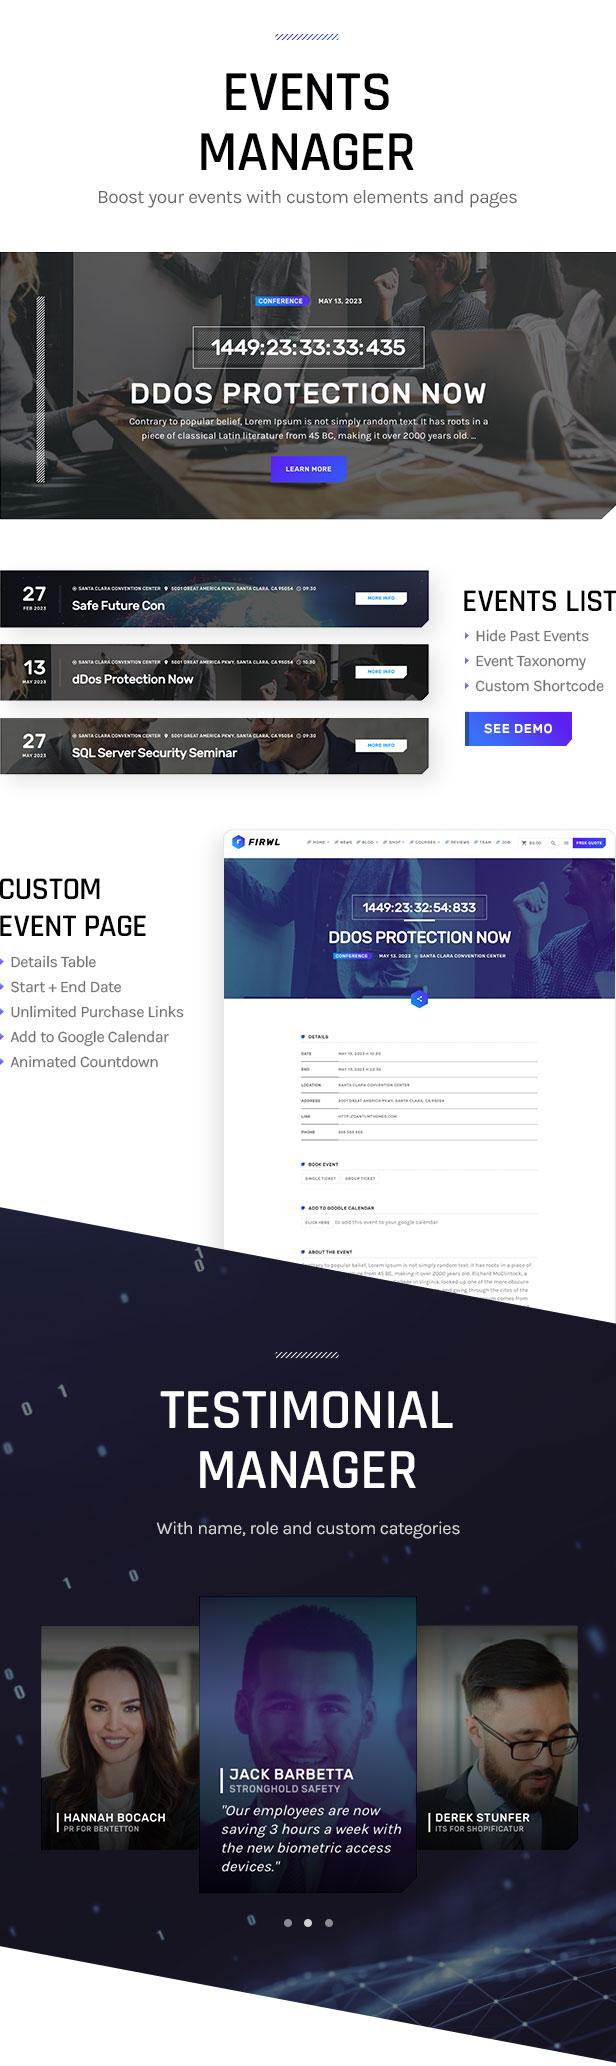 Firwl - Cyber Security WordPress Theme - 13